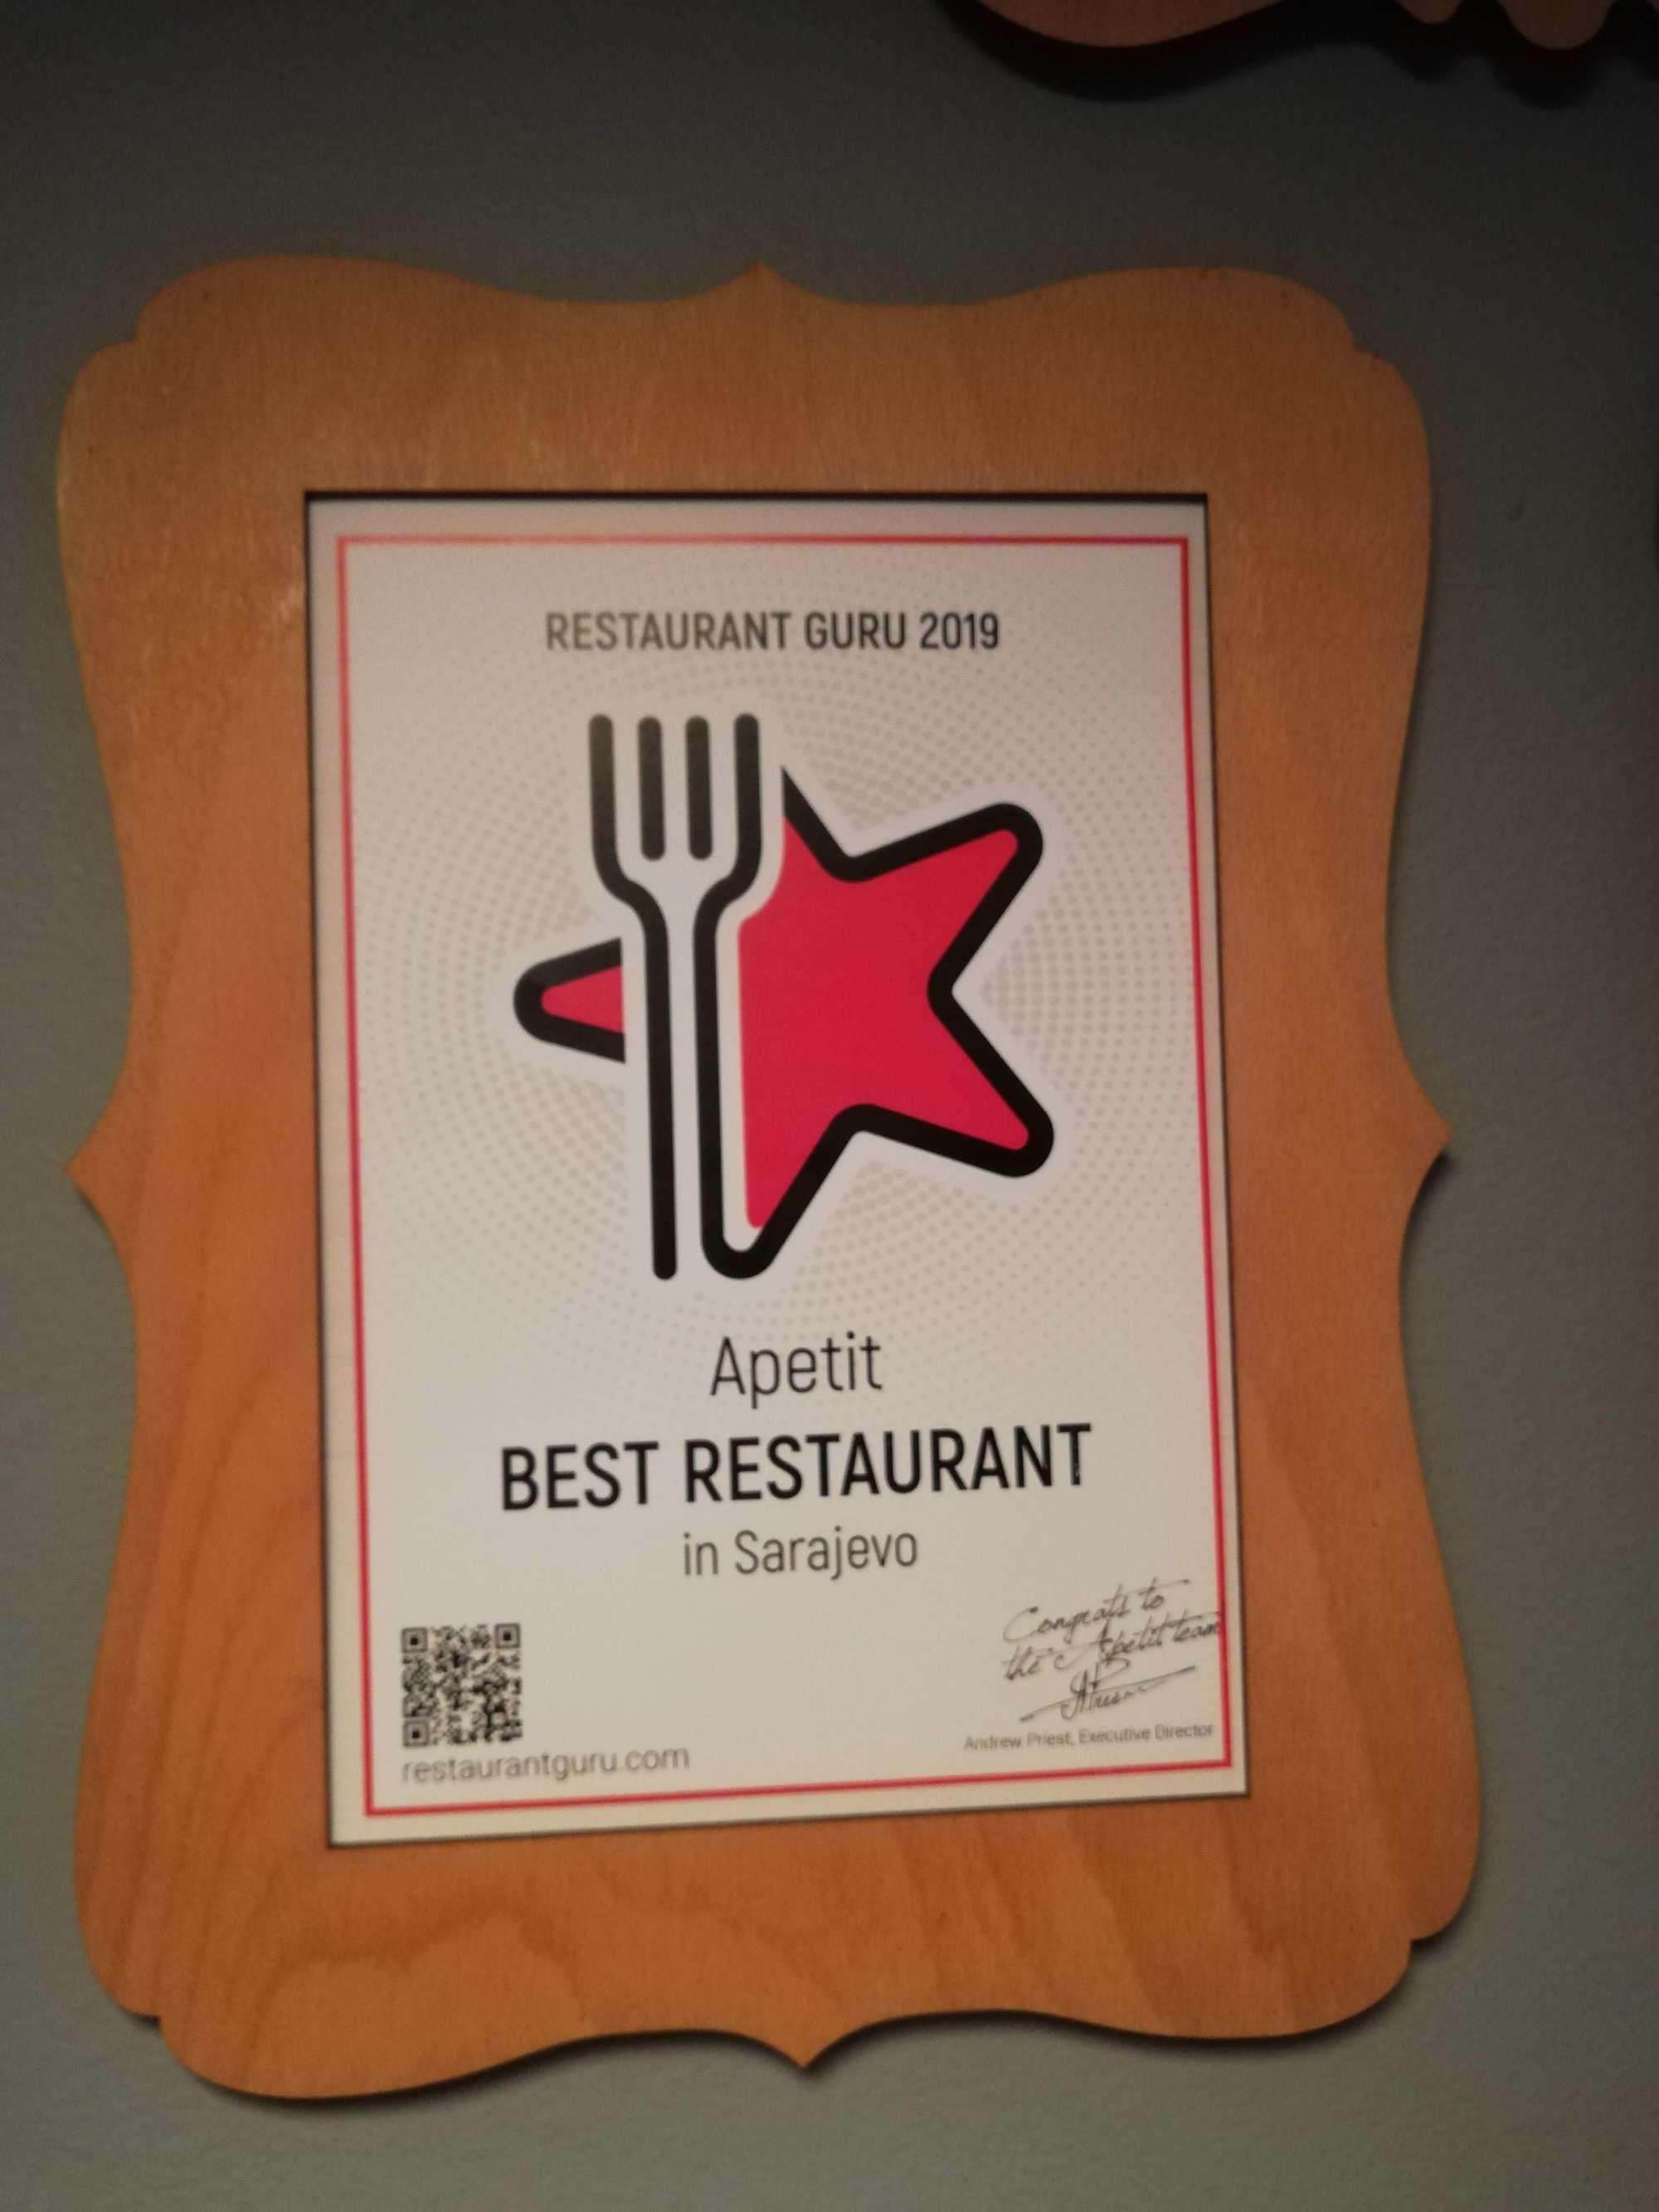 Apetit award